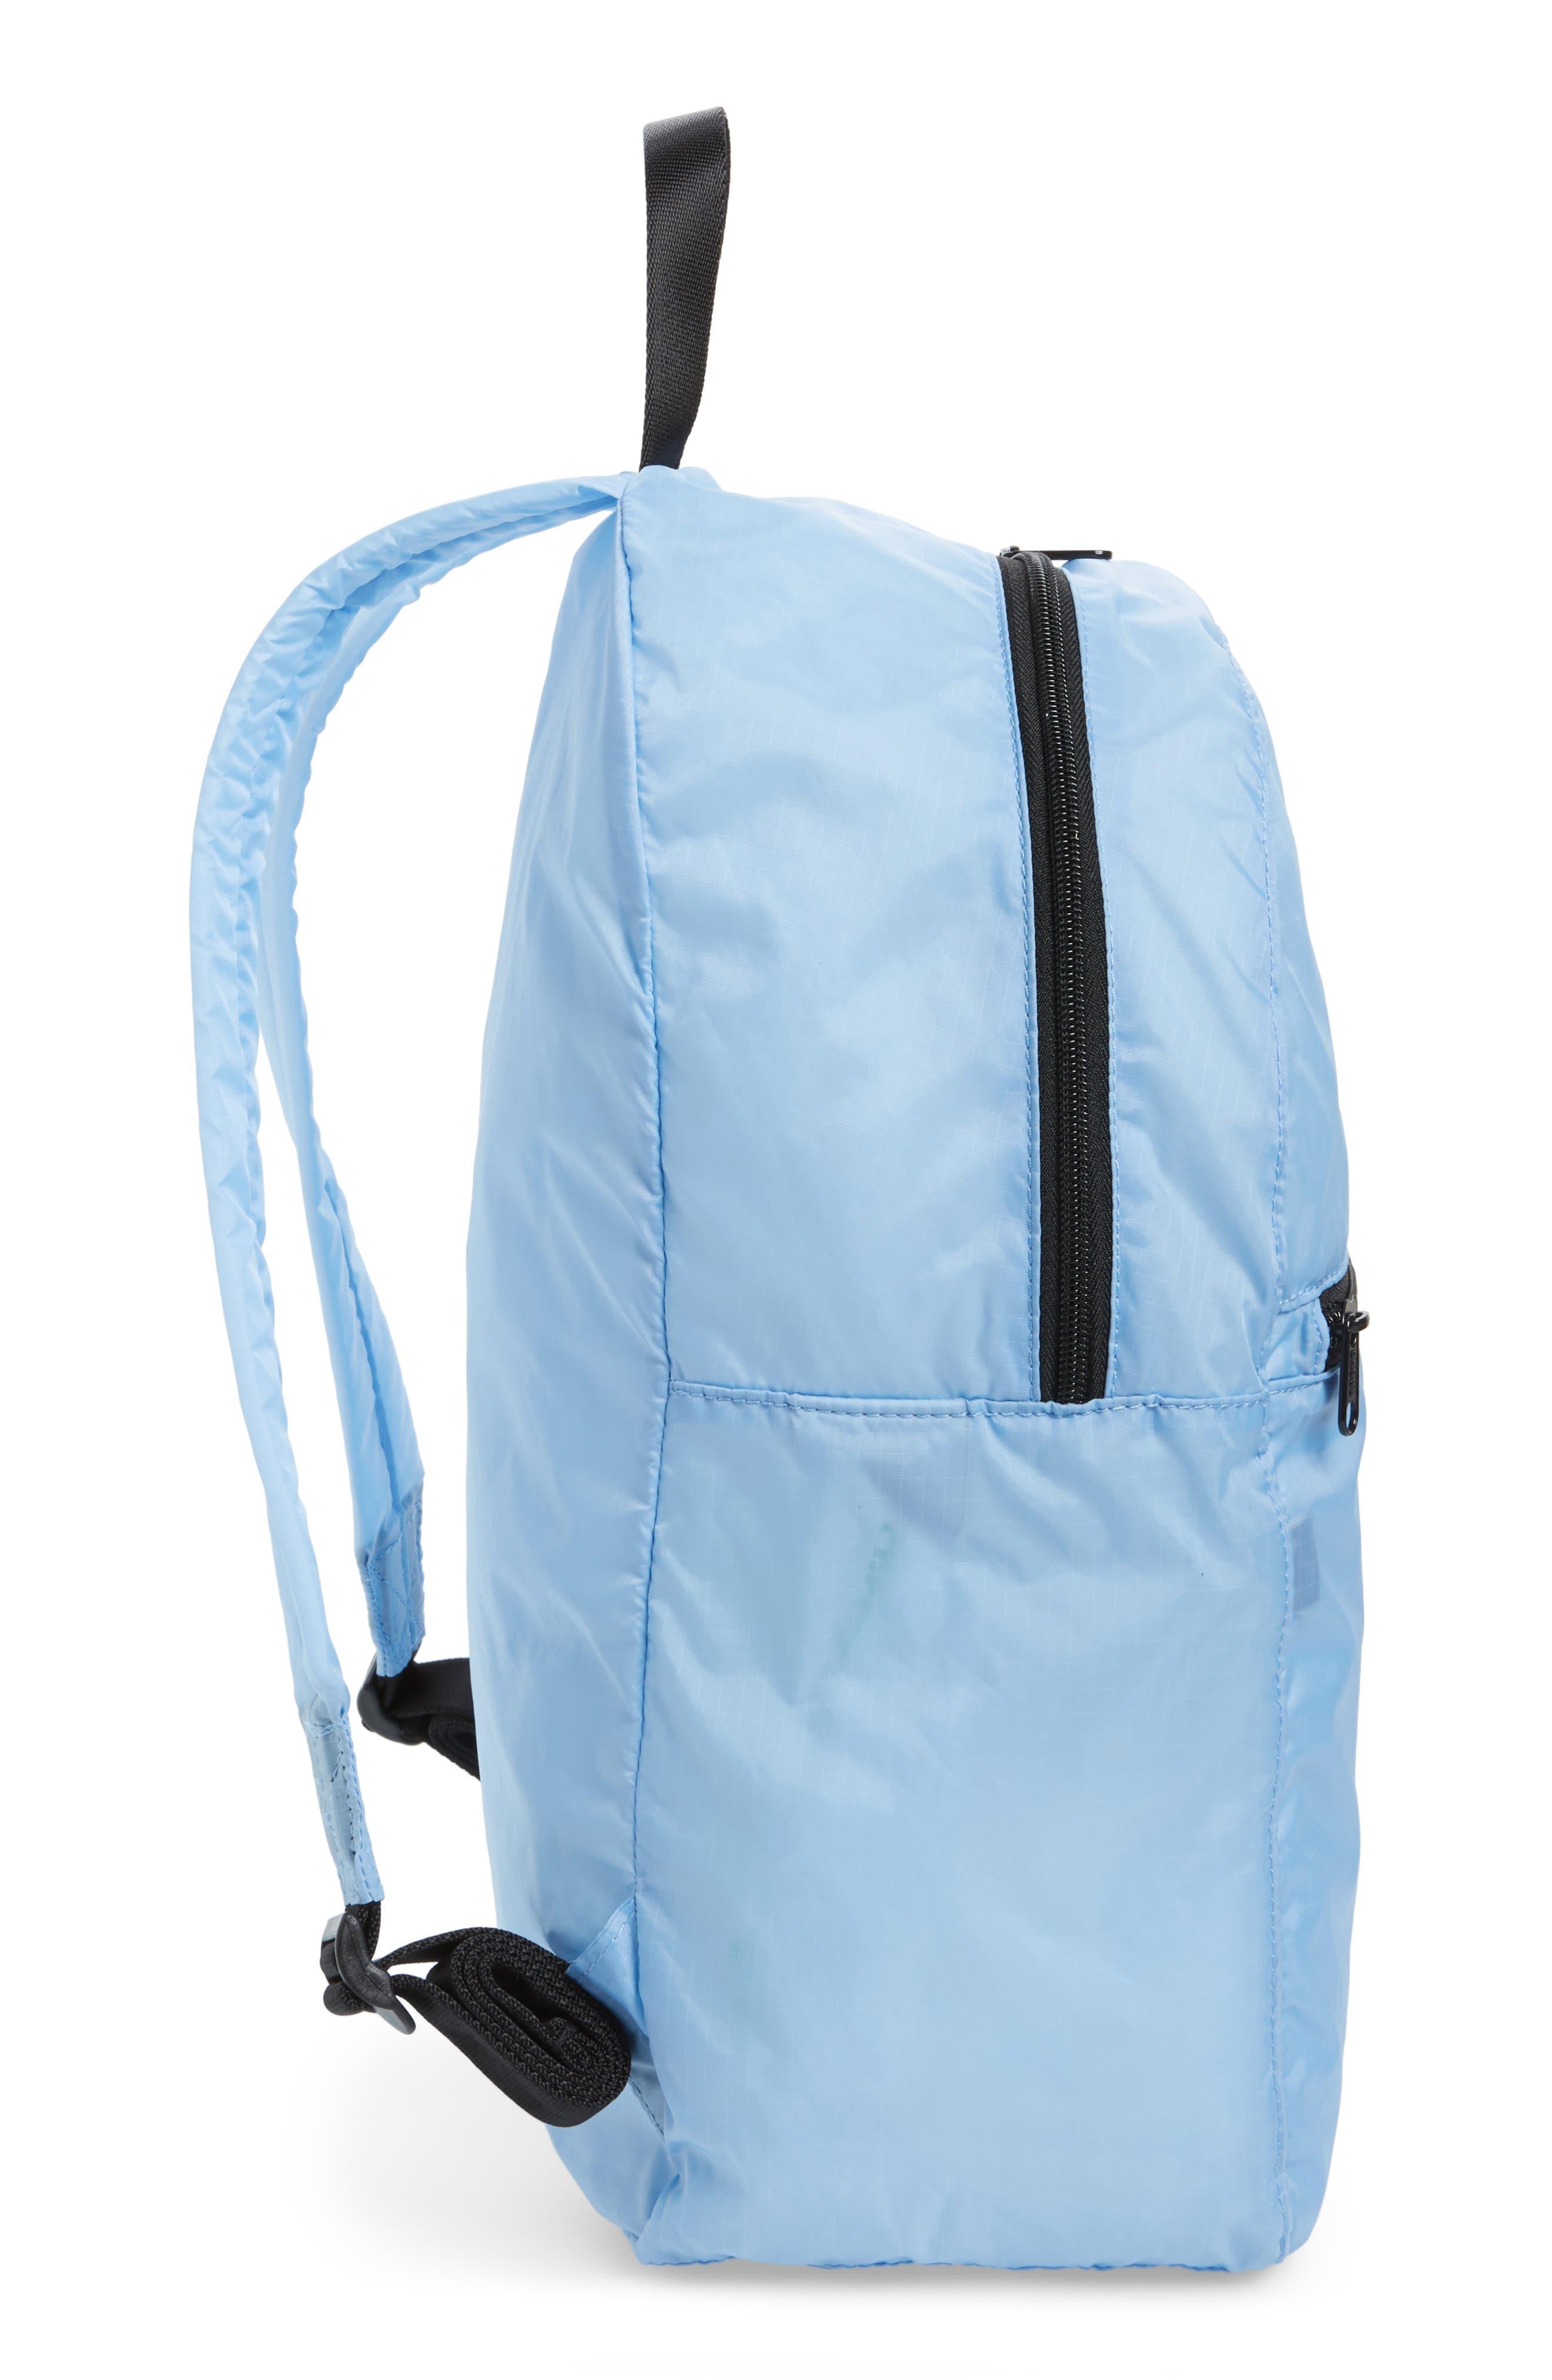 Ripstop Nylon Backpack,                             Alternate thumbnail 19, color,